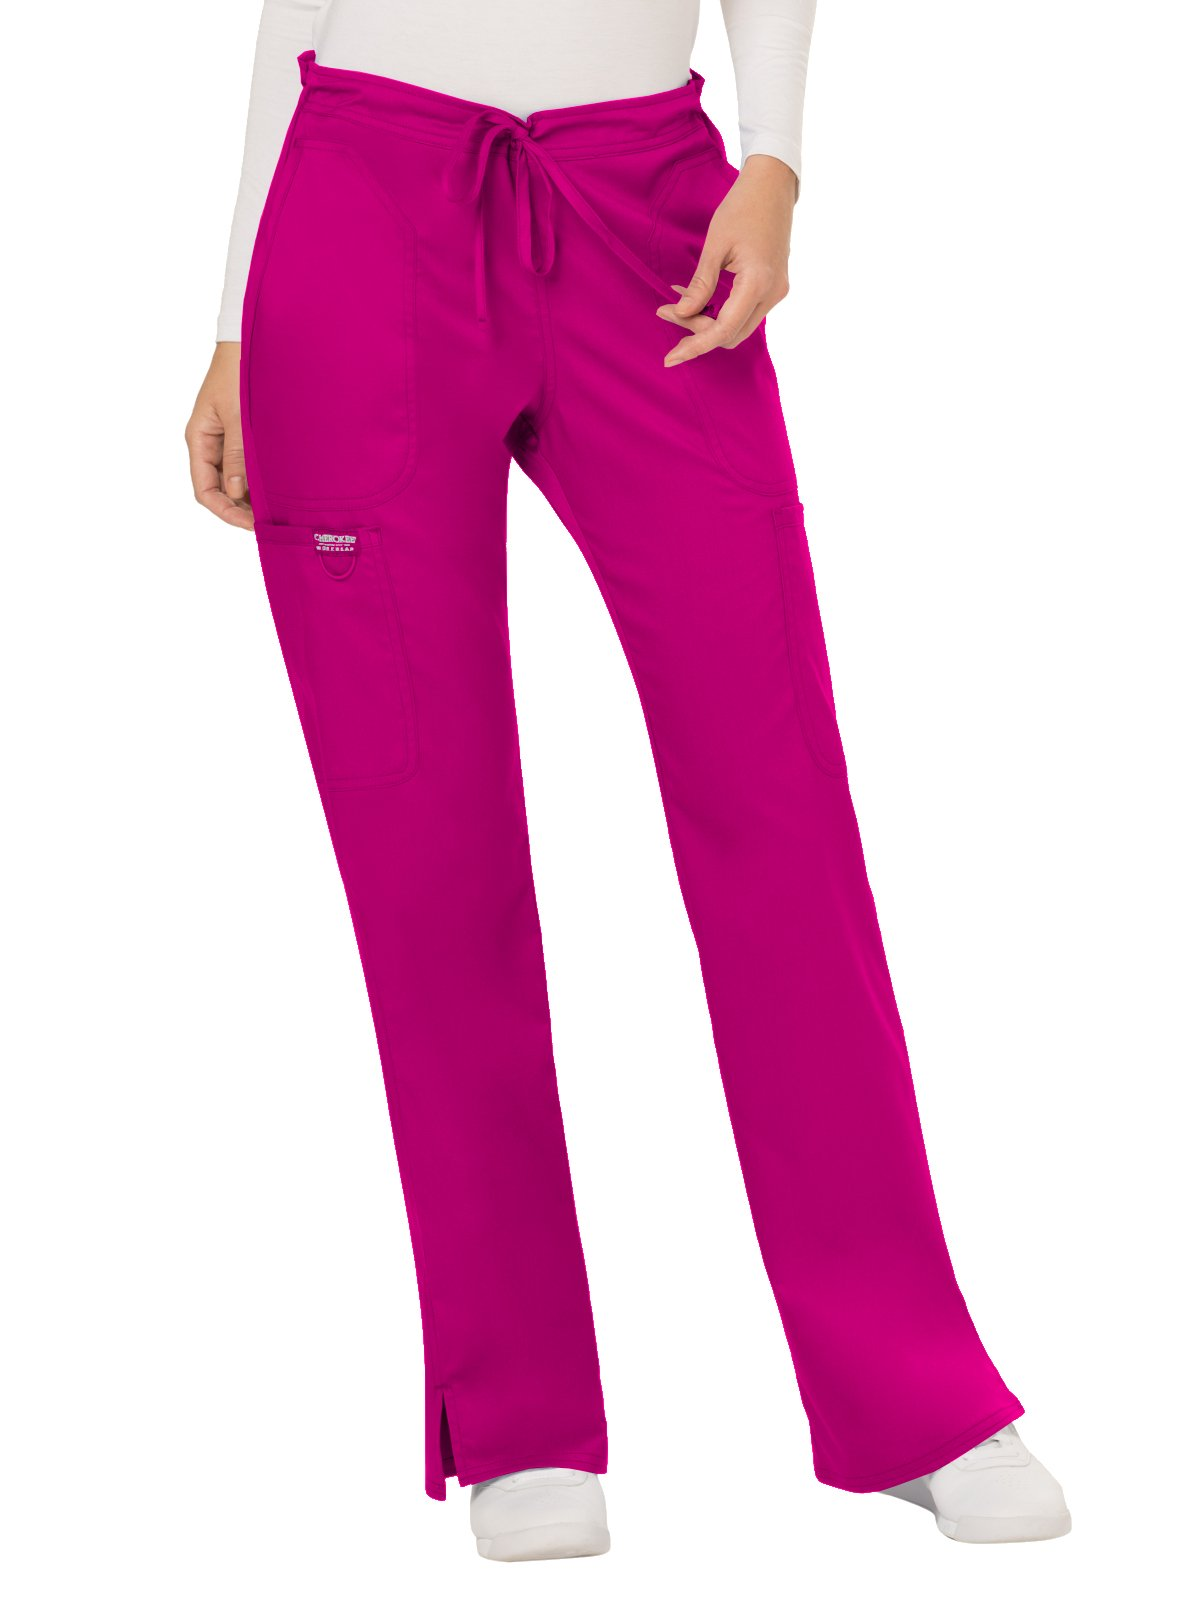 Cherokee Revolution Workwear Women's Drawstring Flare Scrub Pant Small Petite Pink Azalea